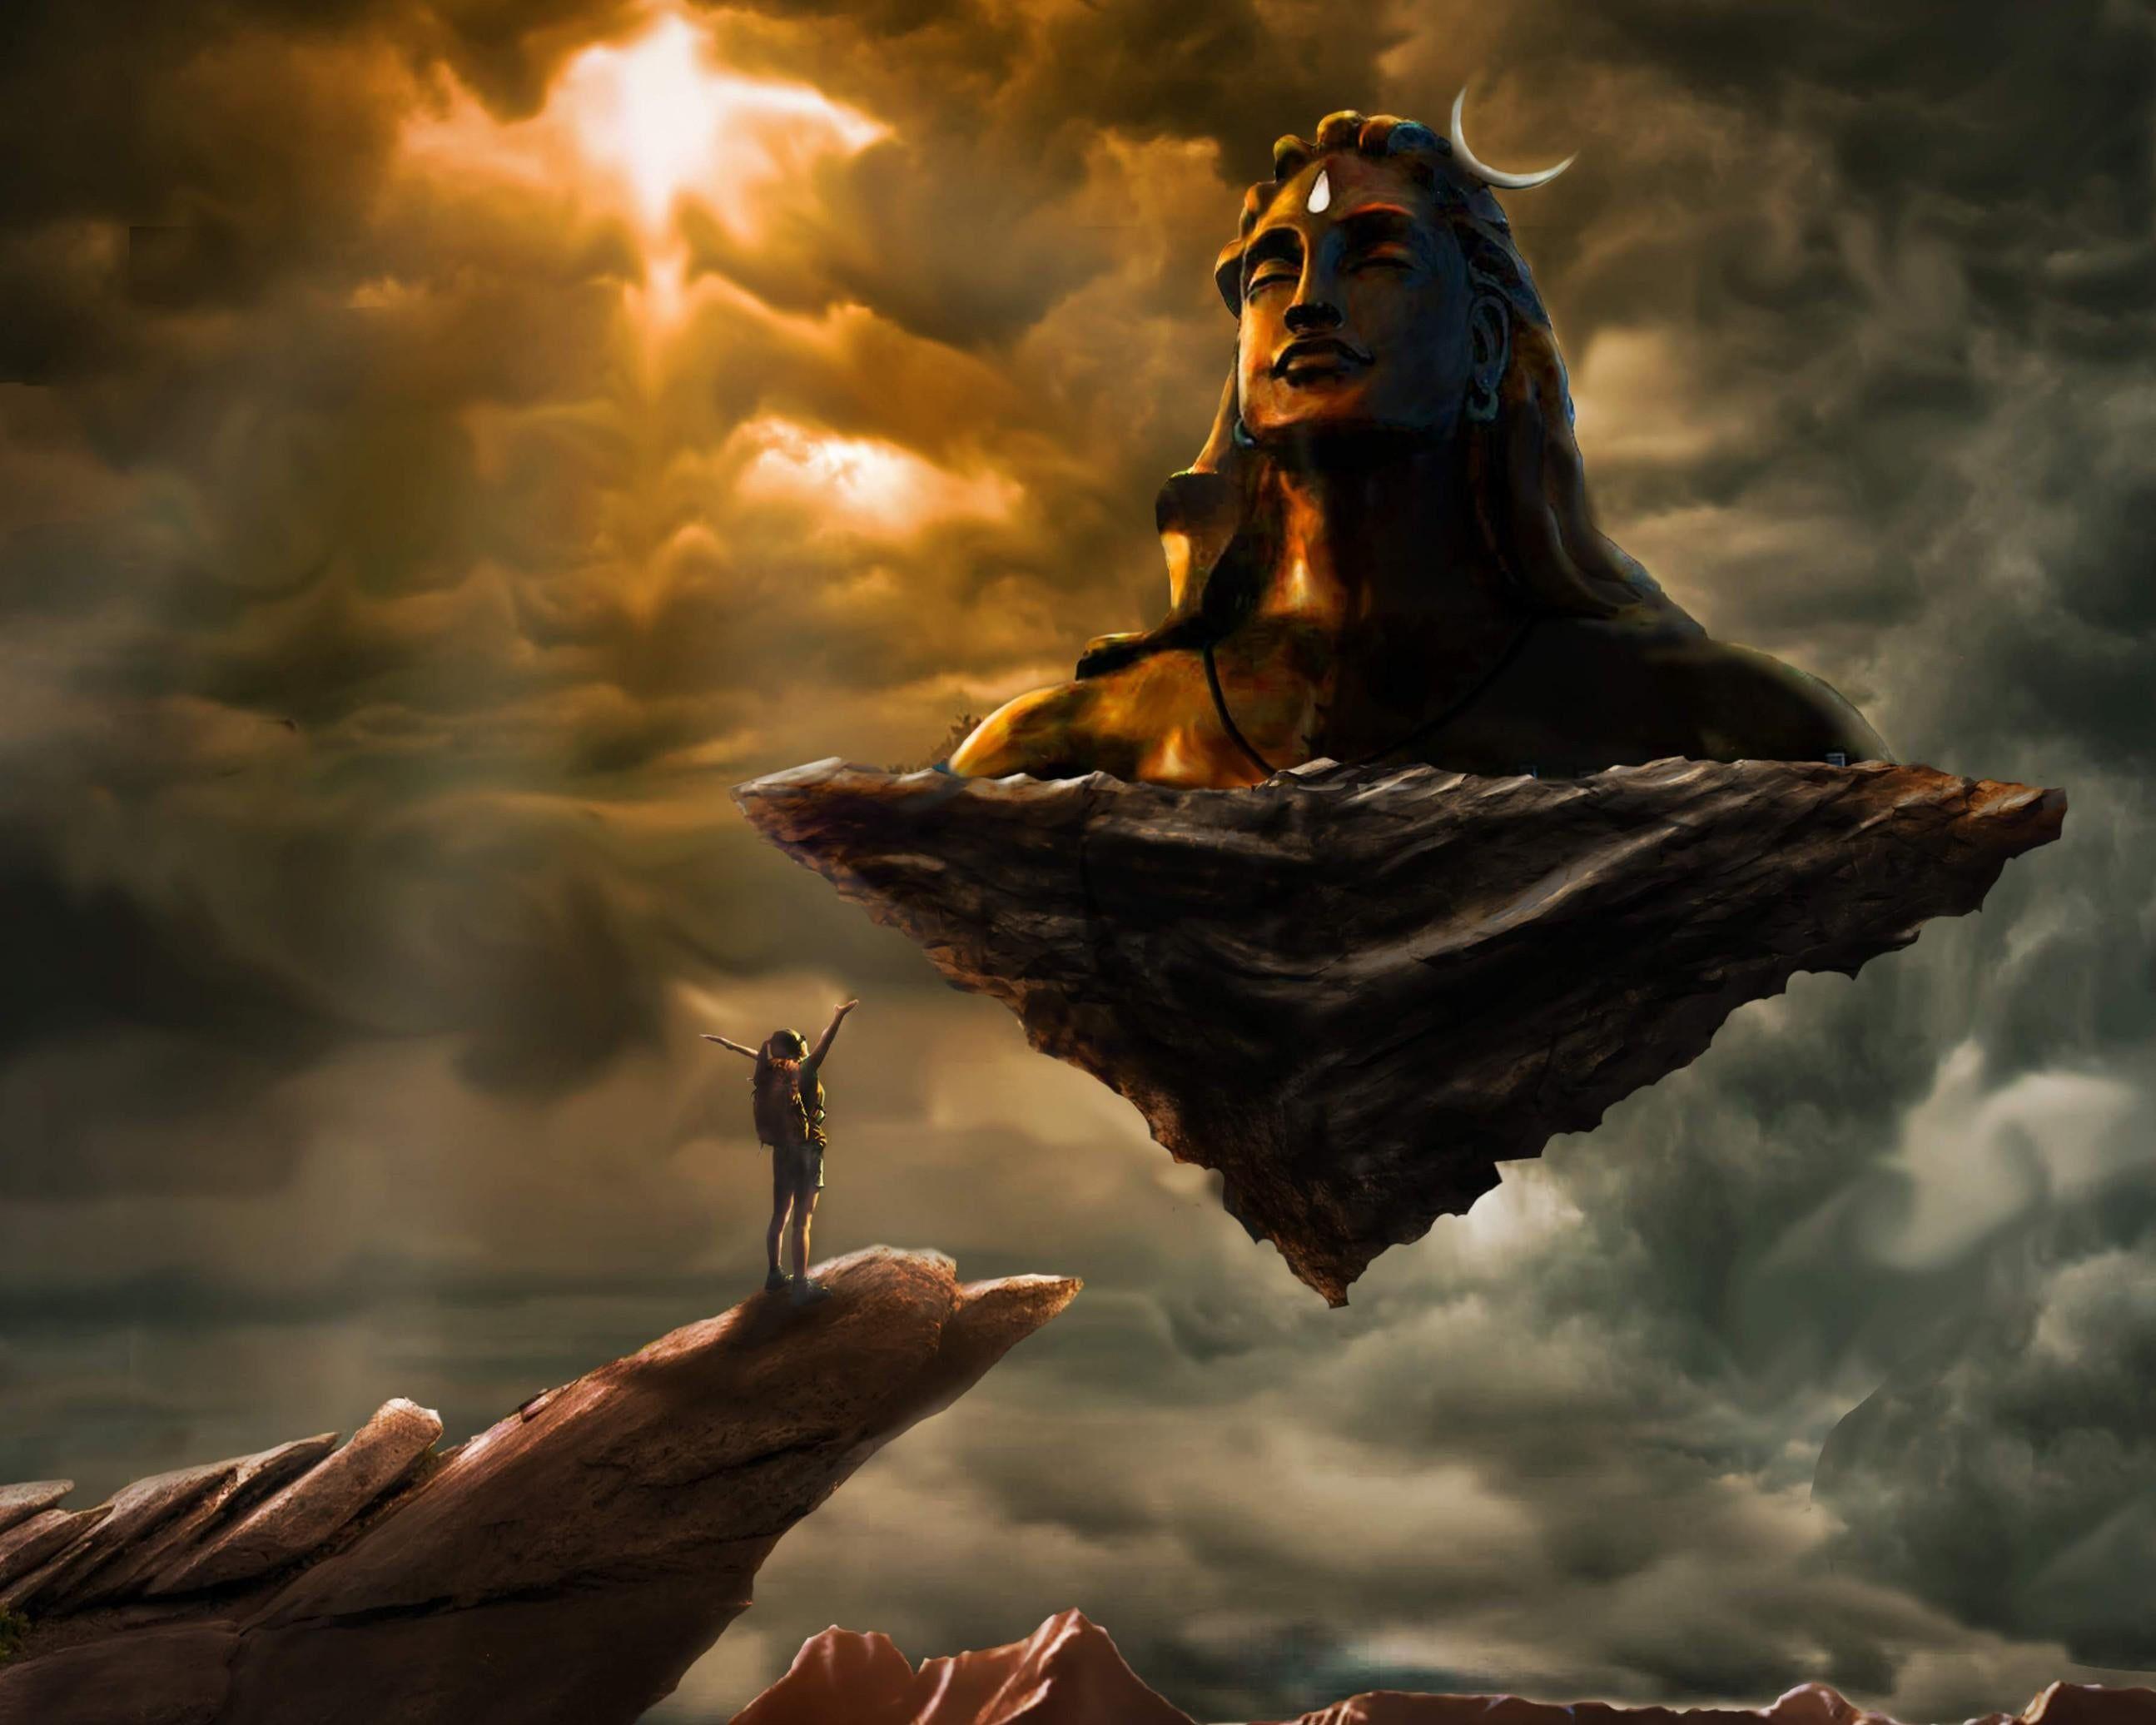 Shiva Hd Wallpaper Photos Of Lord Shiva Lord Shiva Statue Shiva Wallpaper Full hd lord siva images hd 1080p